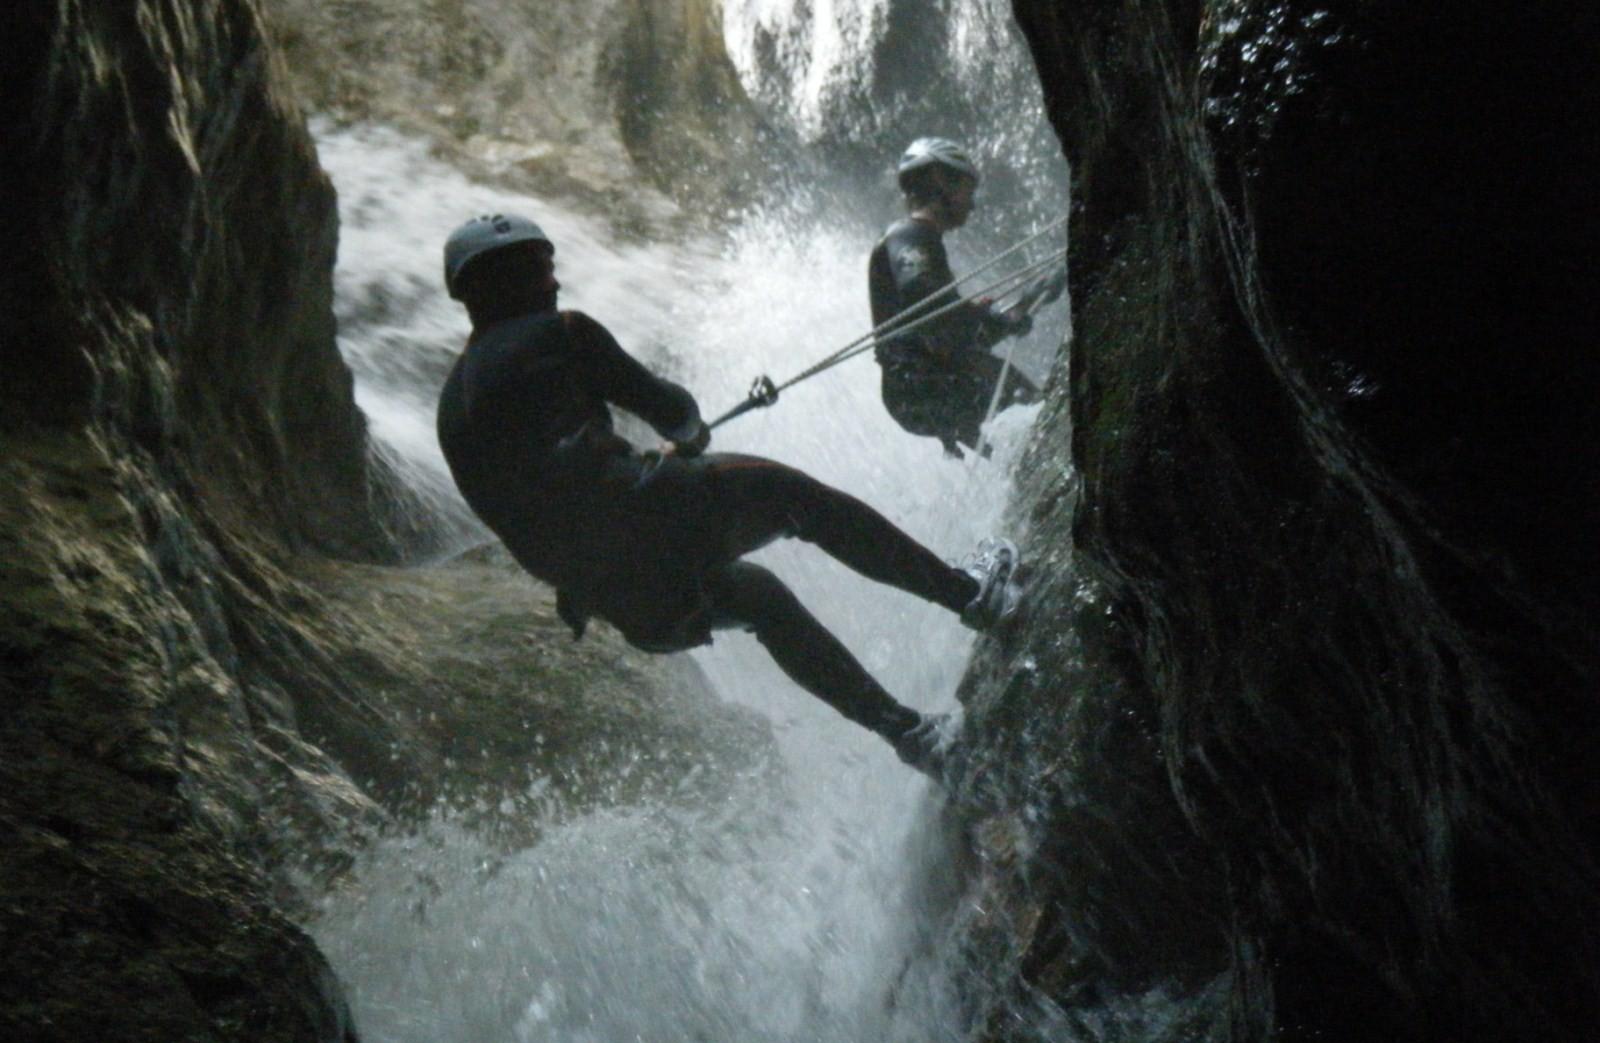 Canyoning Torrente Palvico in Trentino Alto Adige